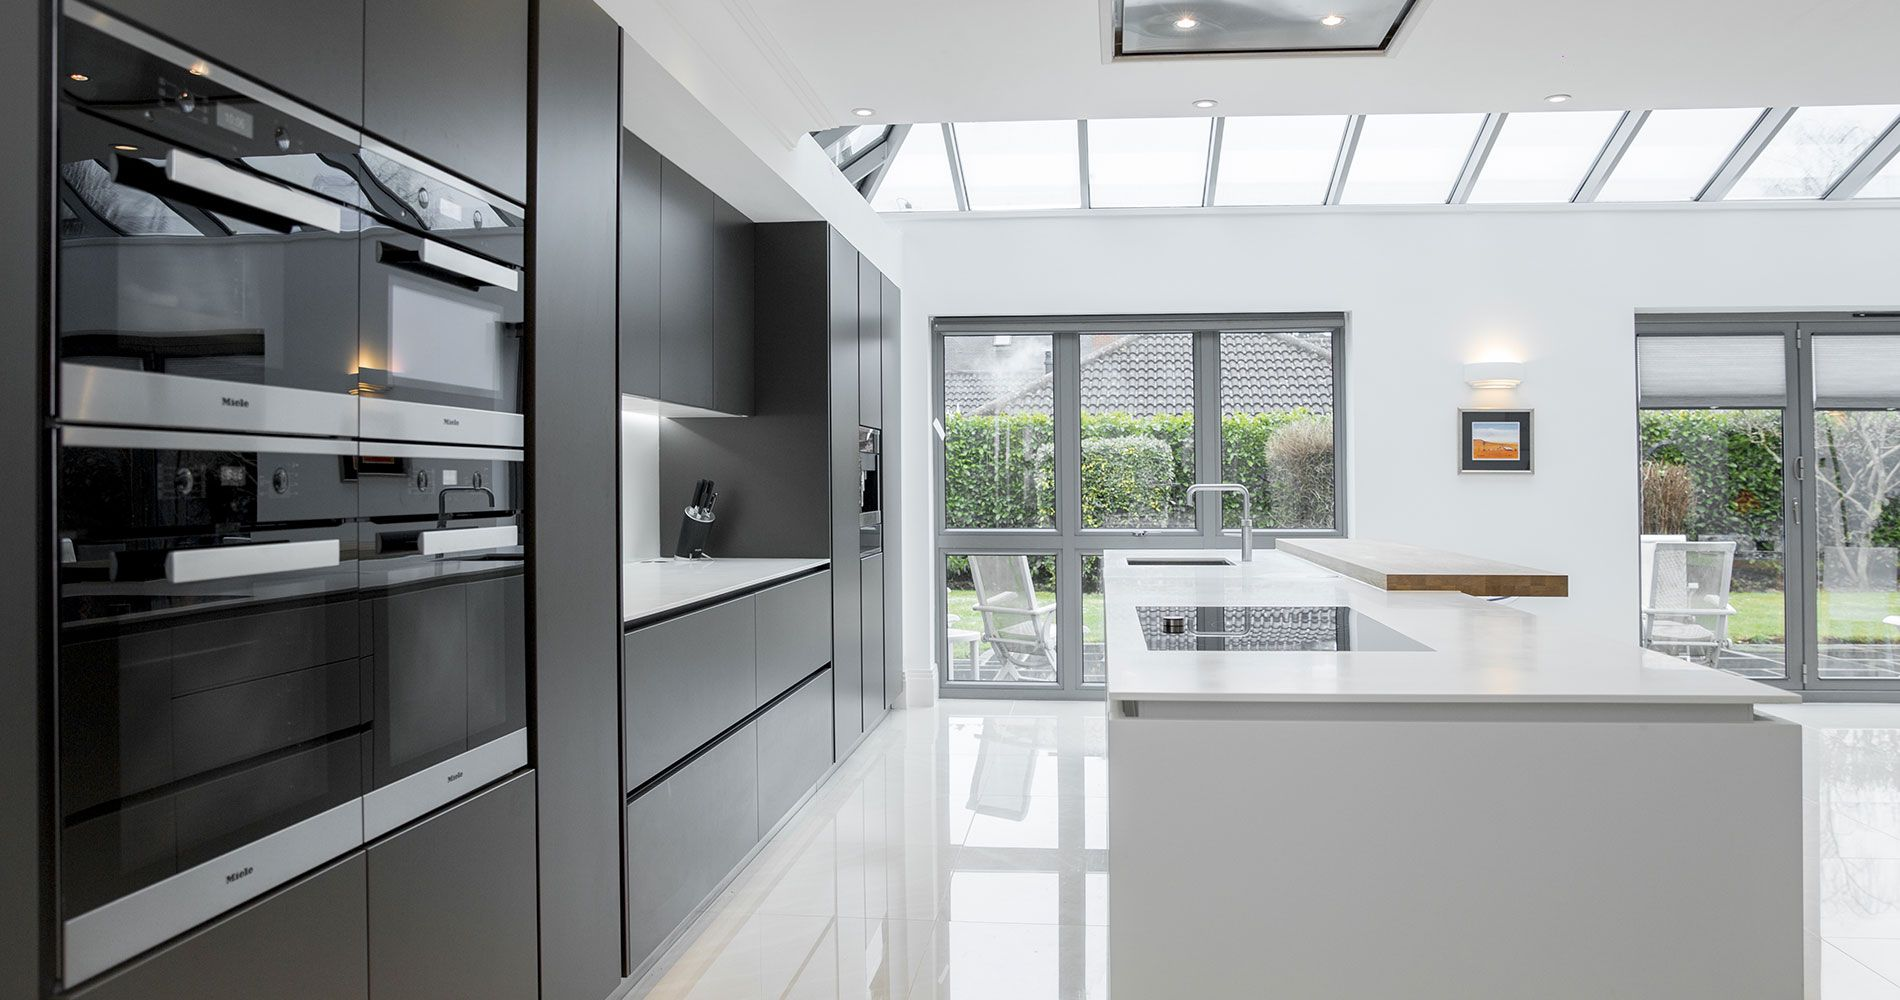 Innova küchen ~ Innova cento graphite modern kitchen graphite kitchens and modern